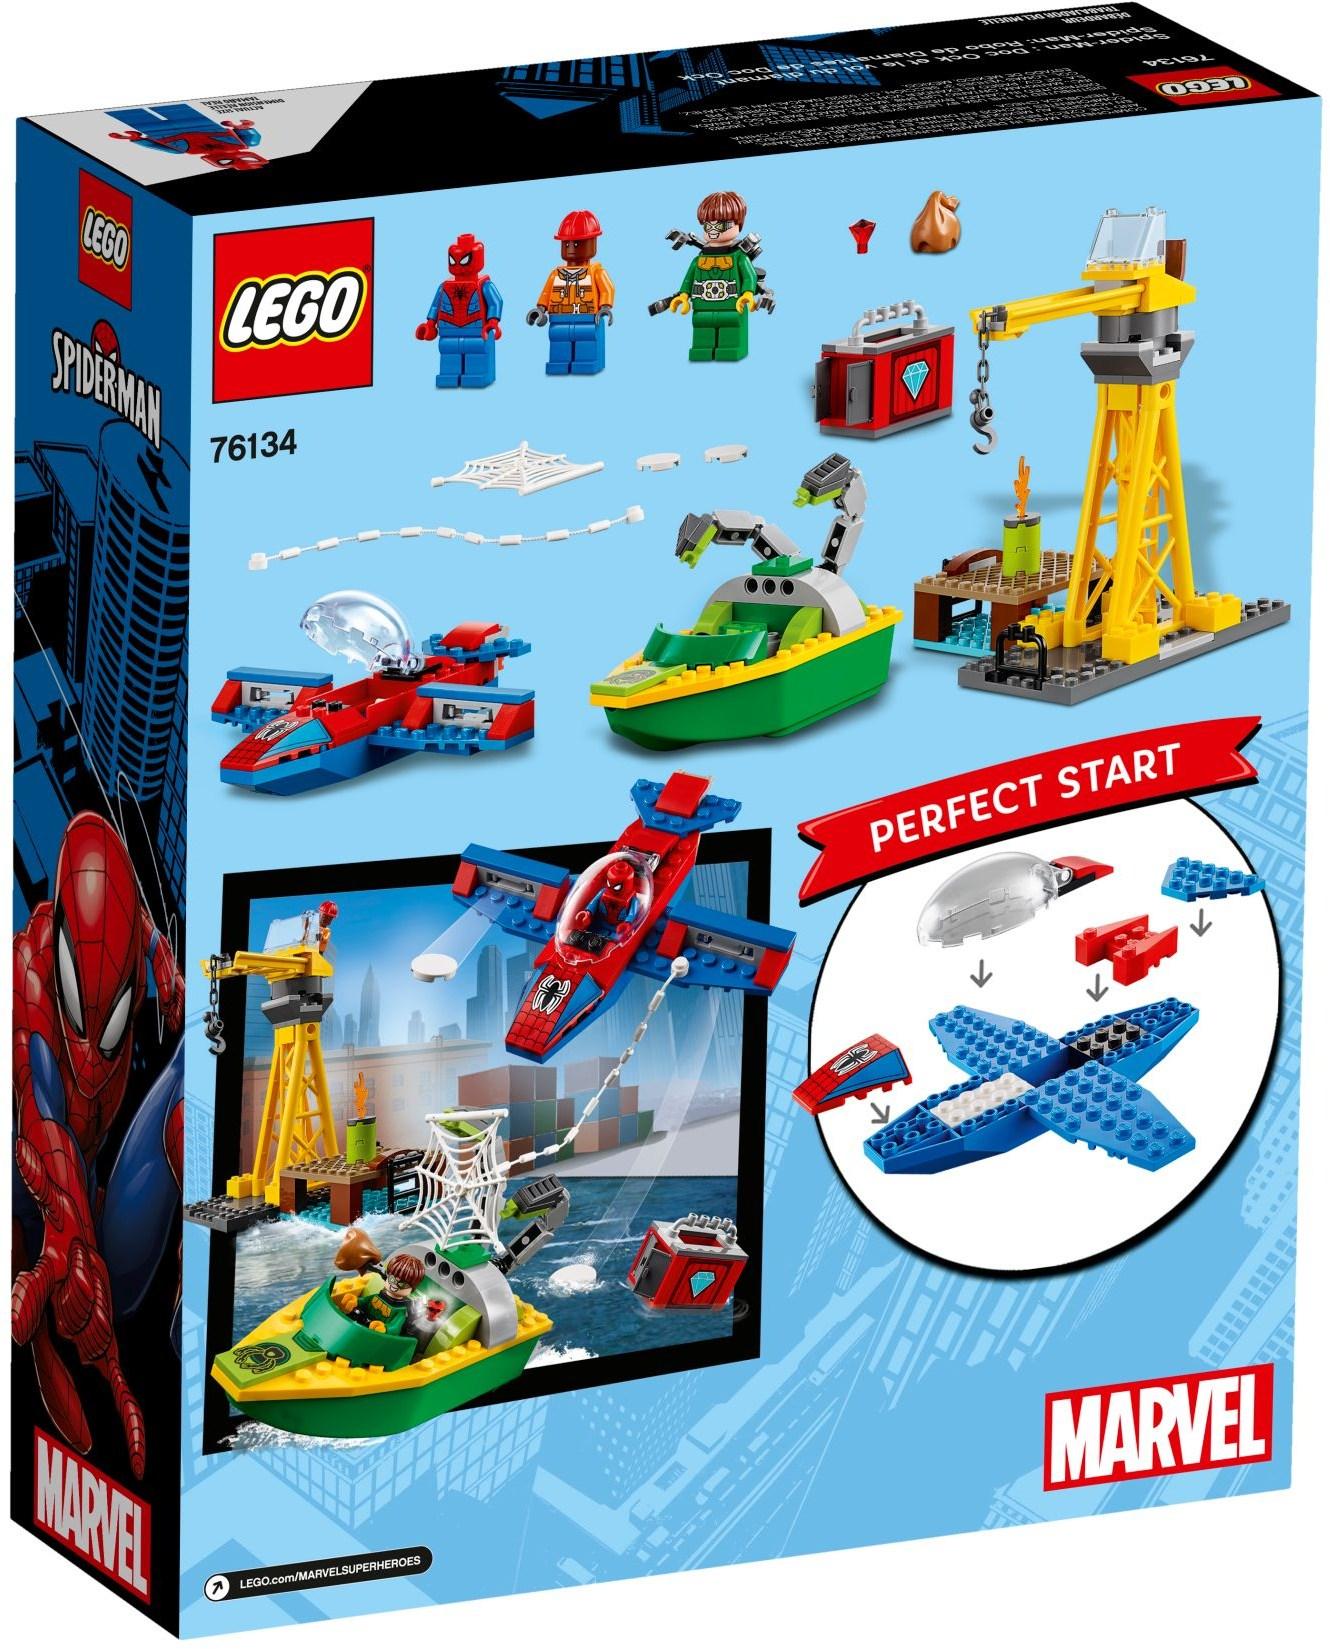 LEGO SPIDERMAN DOC OCK DIAMOND HEIST - 76134